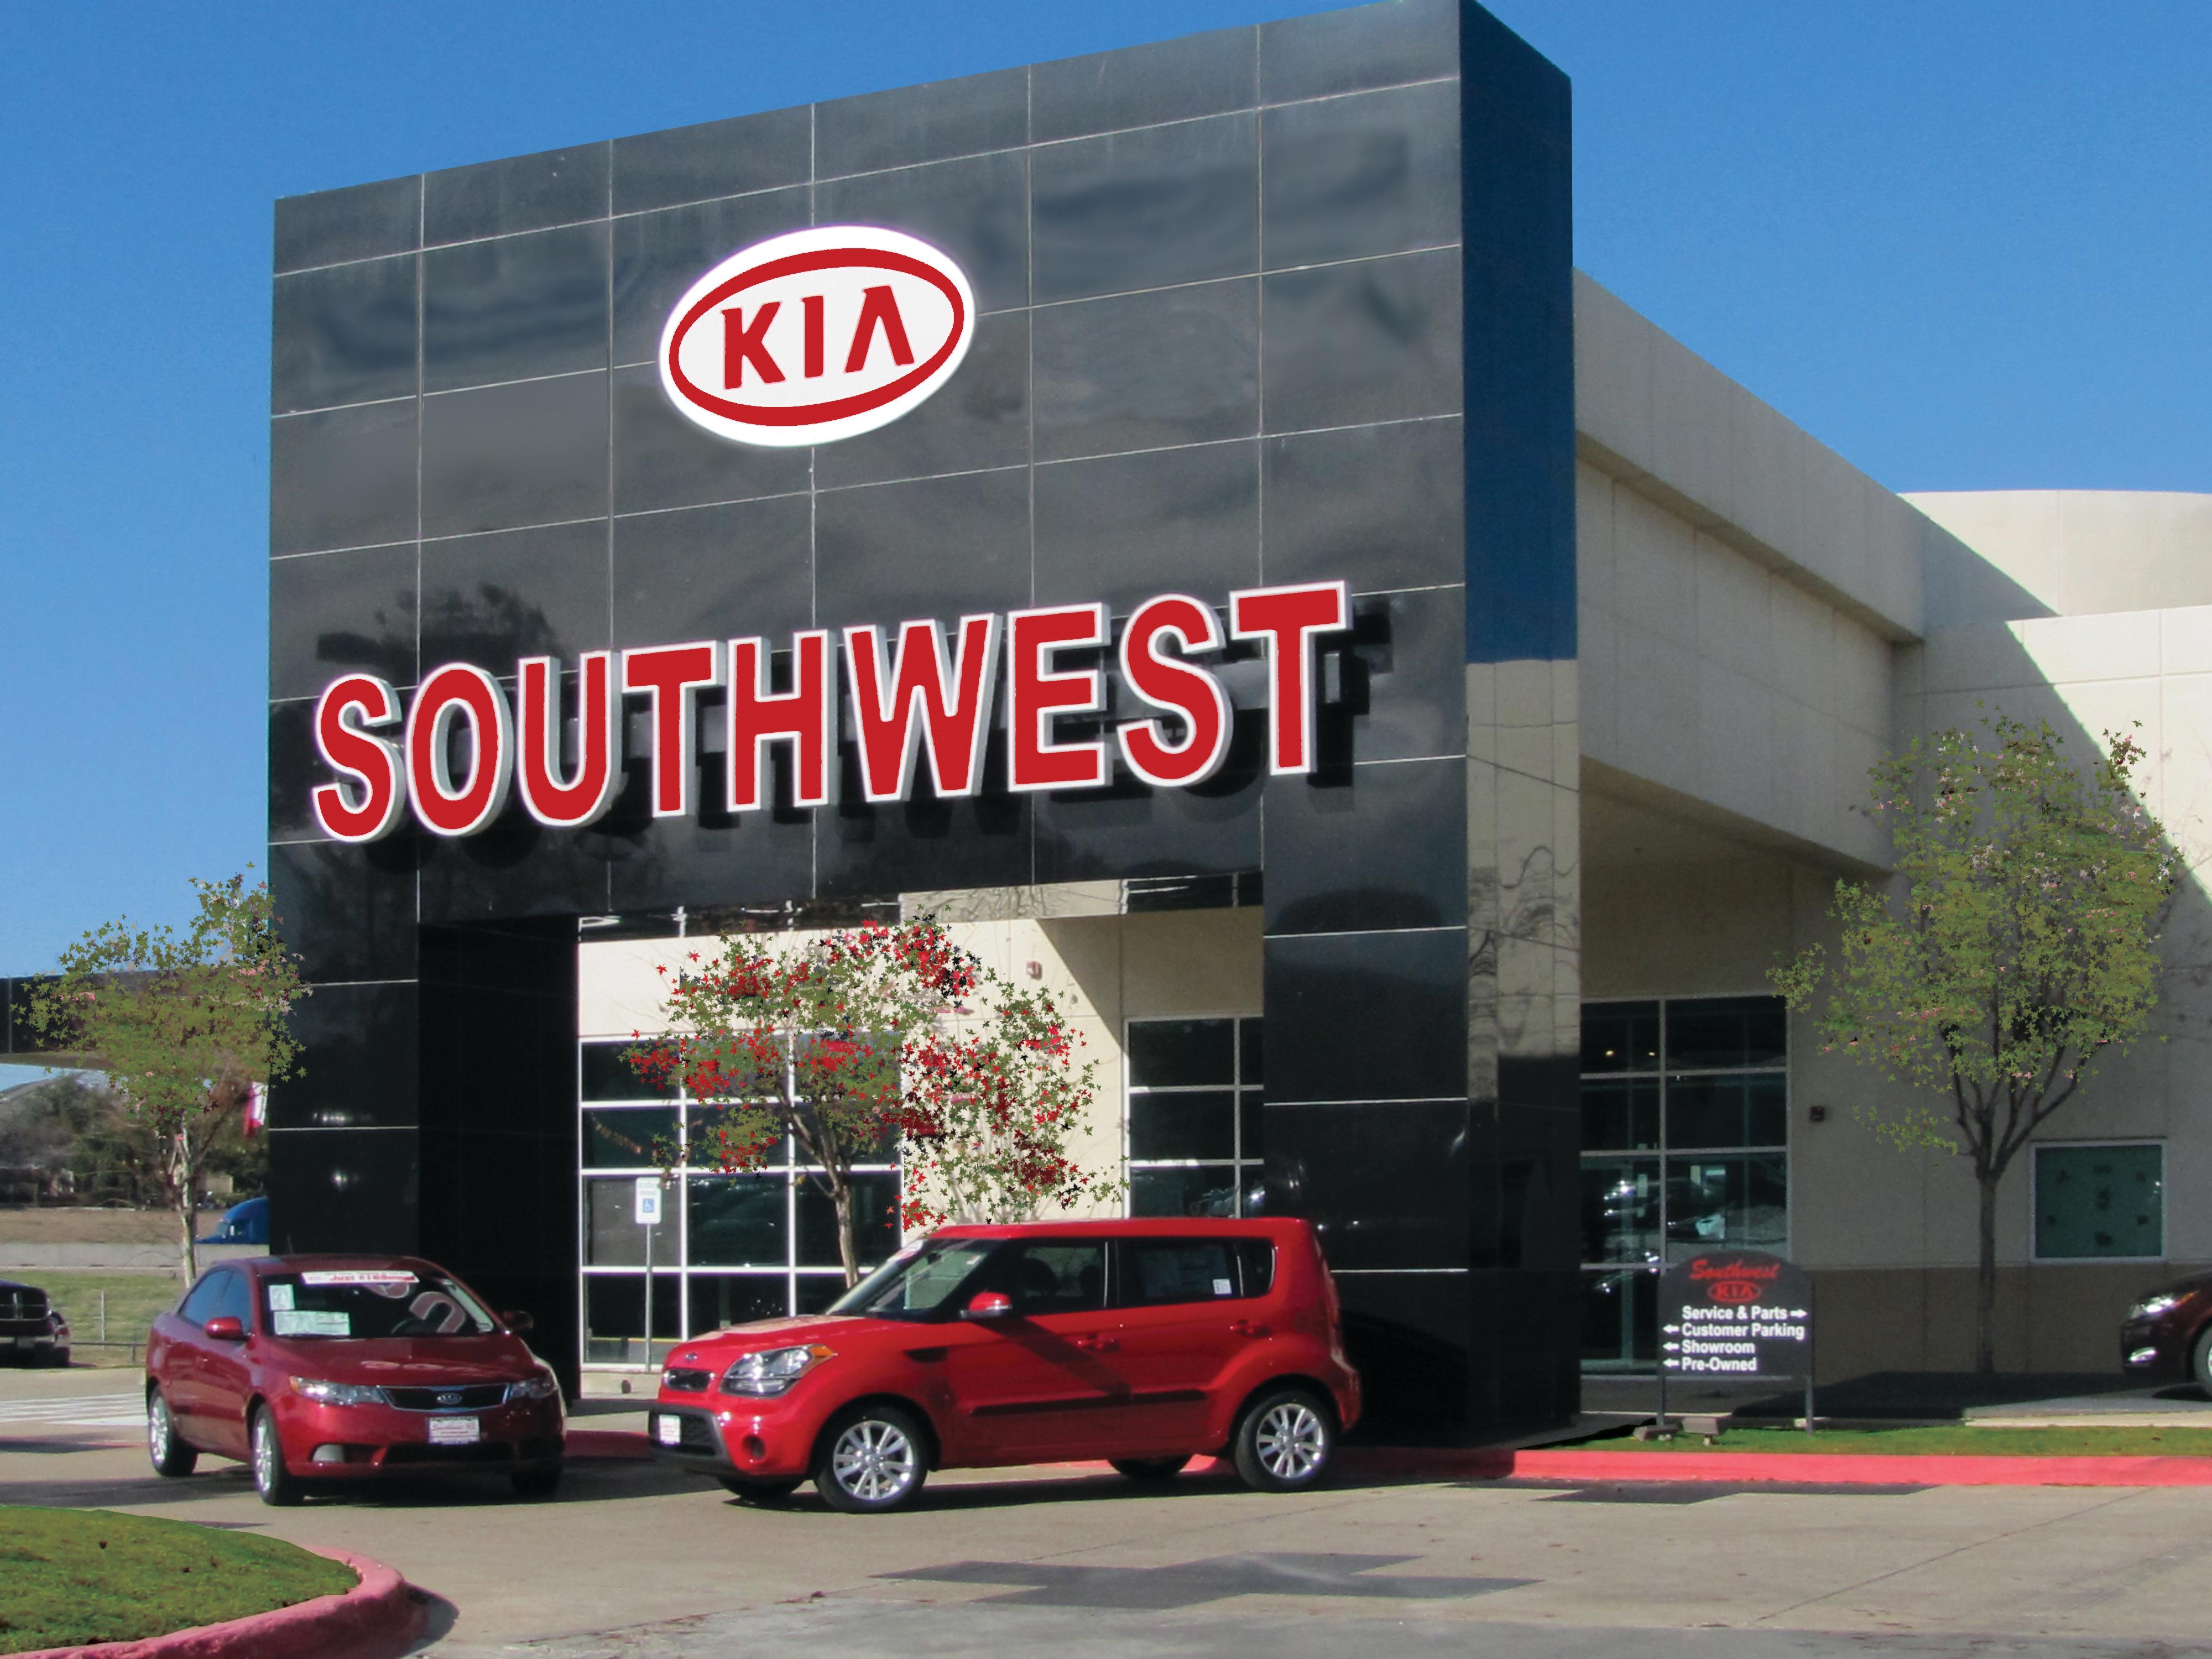 Kia Dealership In Dallas The Queen Kapiolani Hotel